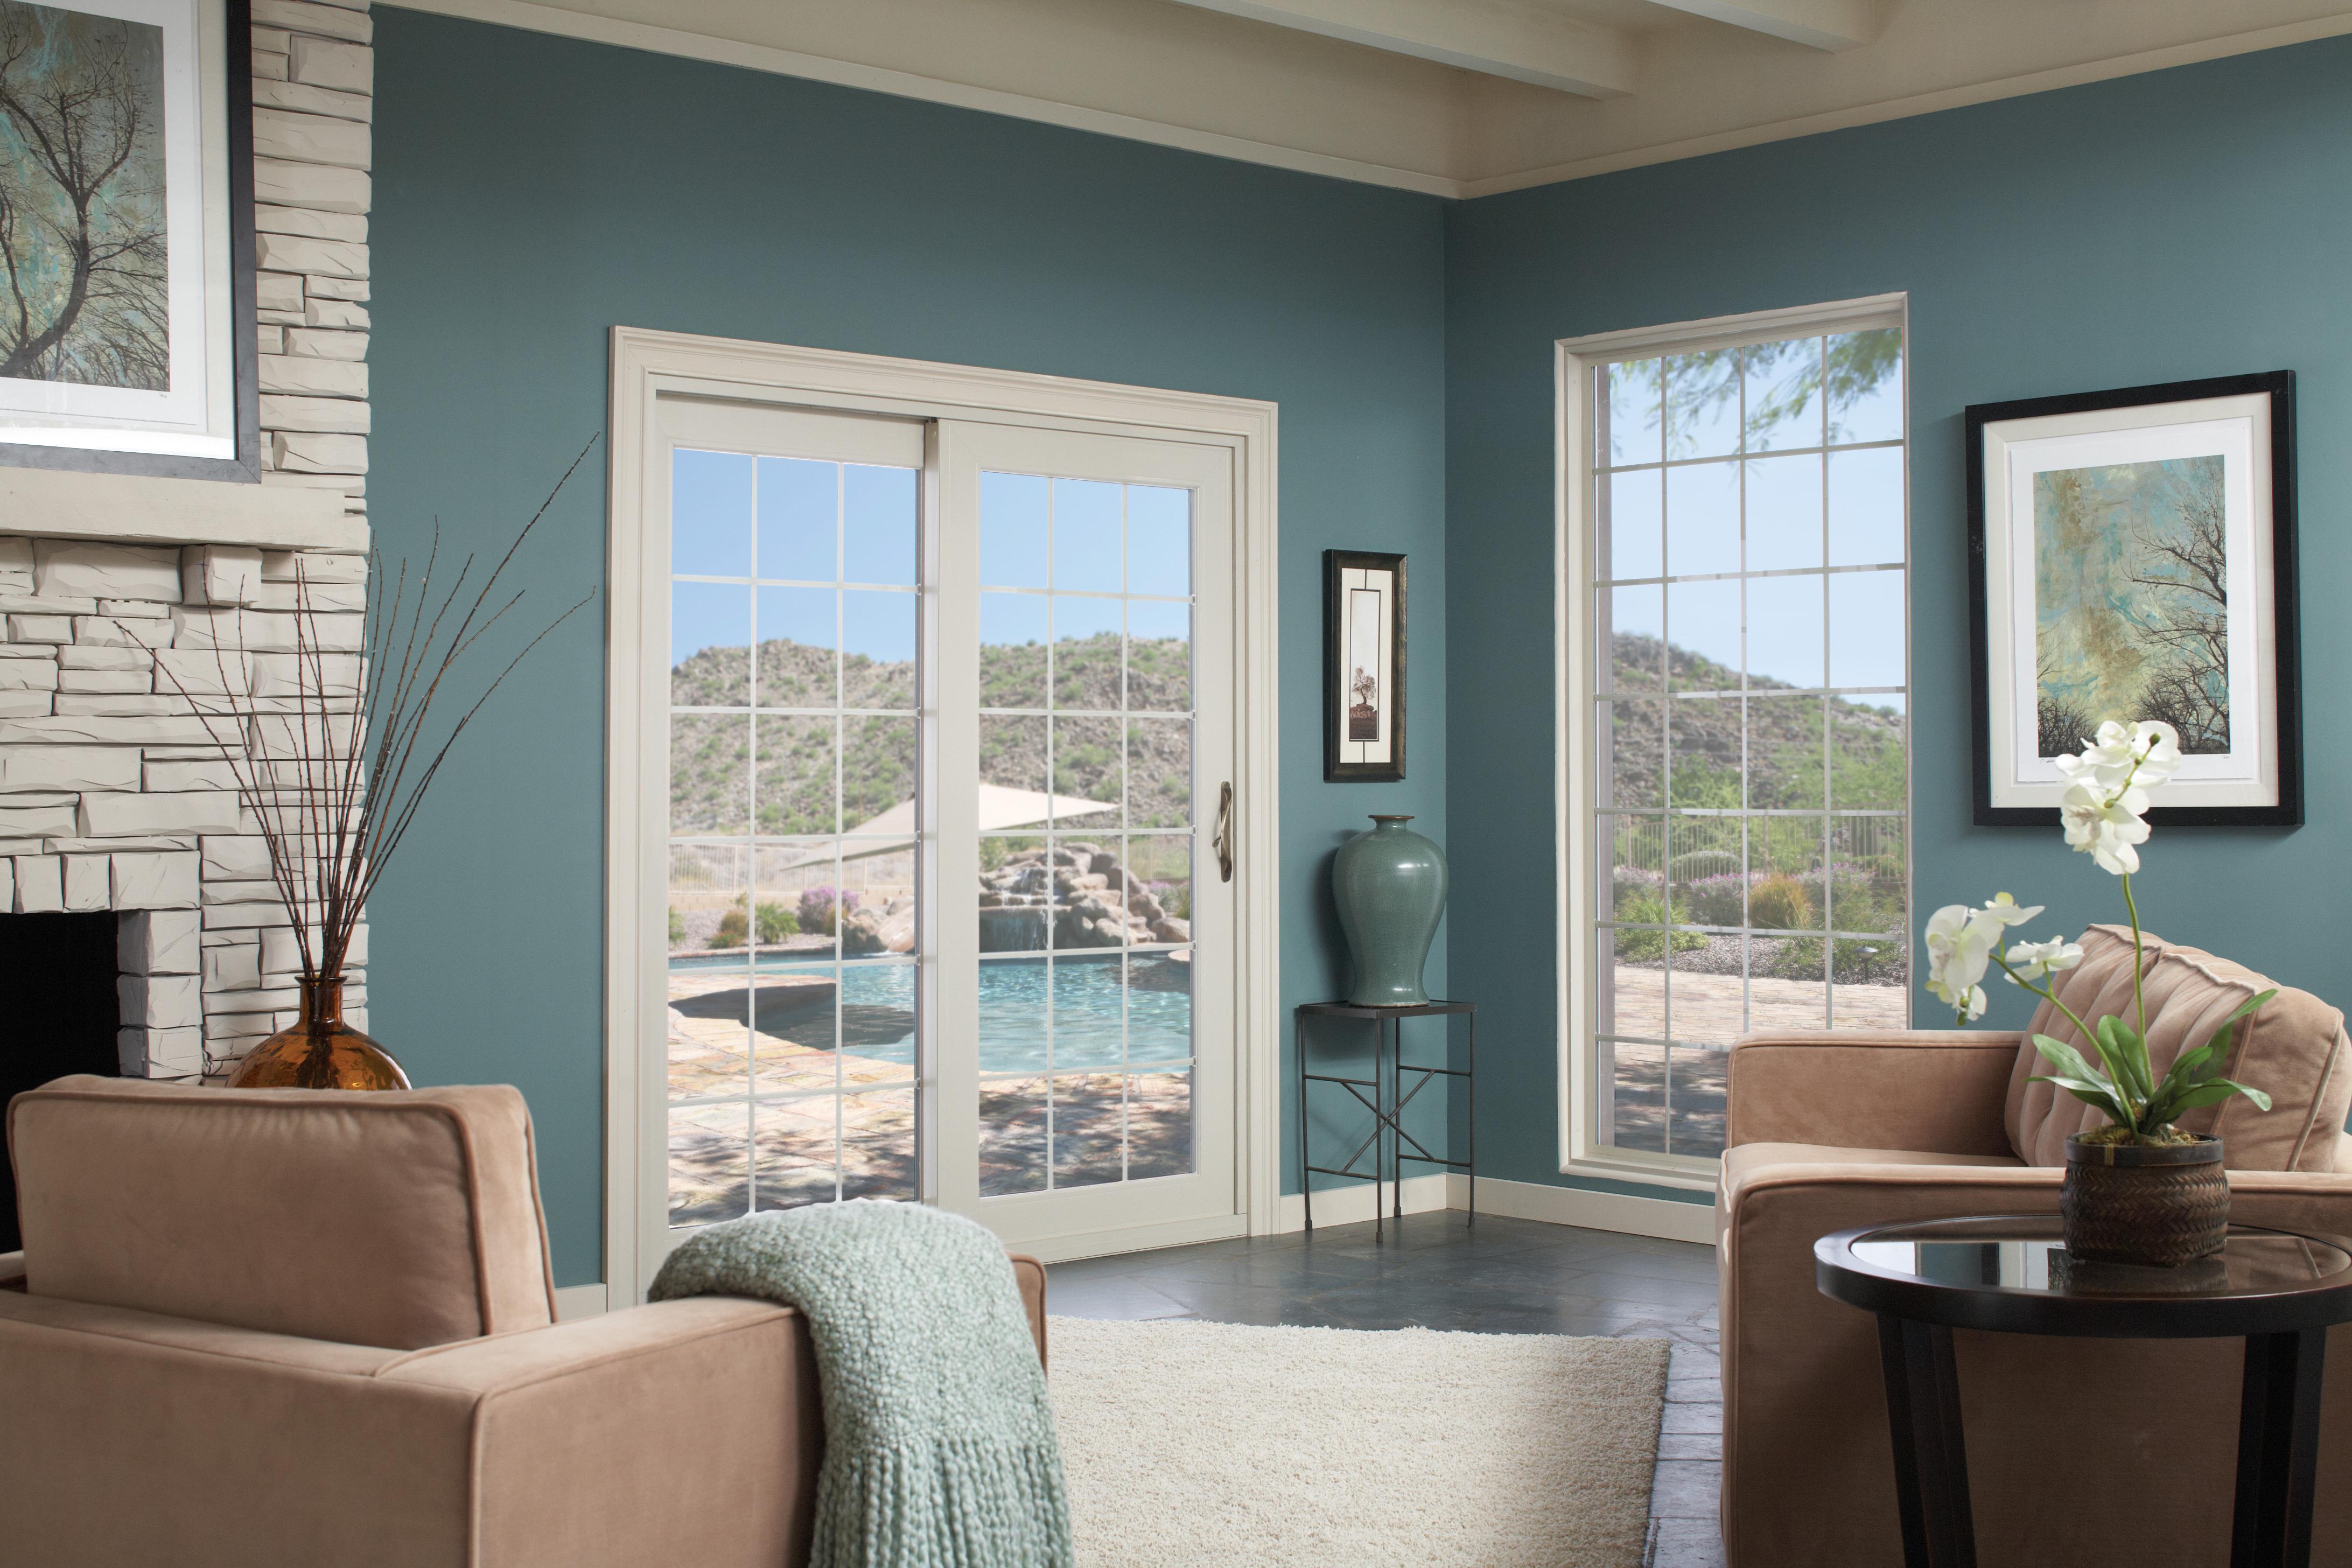 red screen glass wood restorationsred with doors door windows panels restorations handcrafted storm and river win